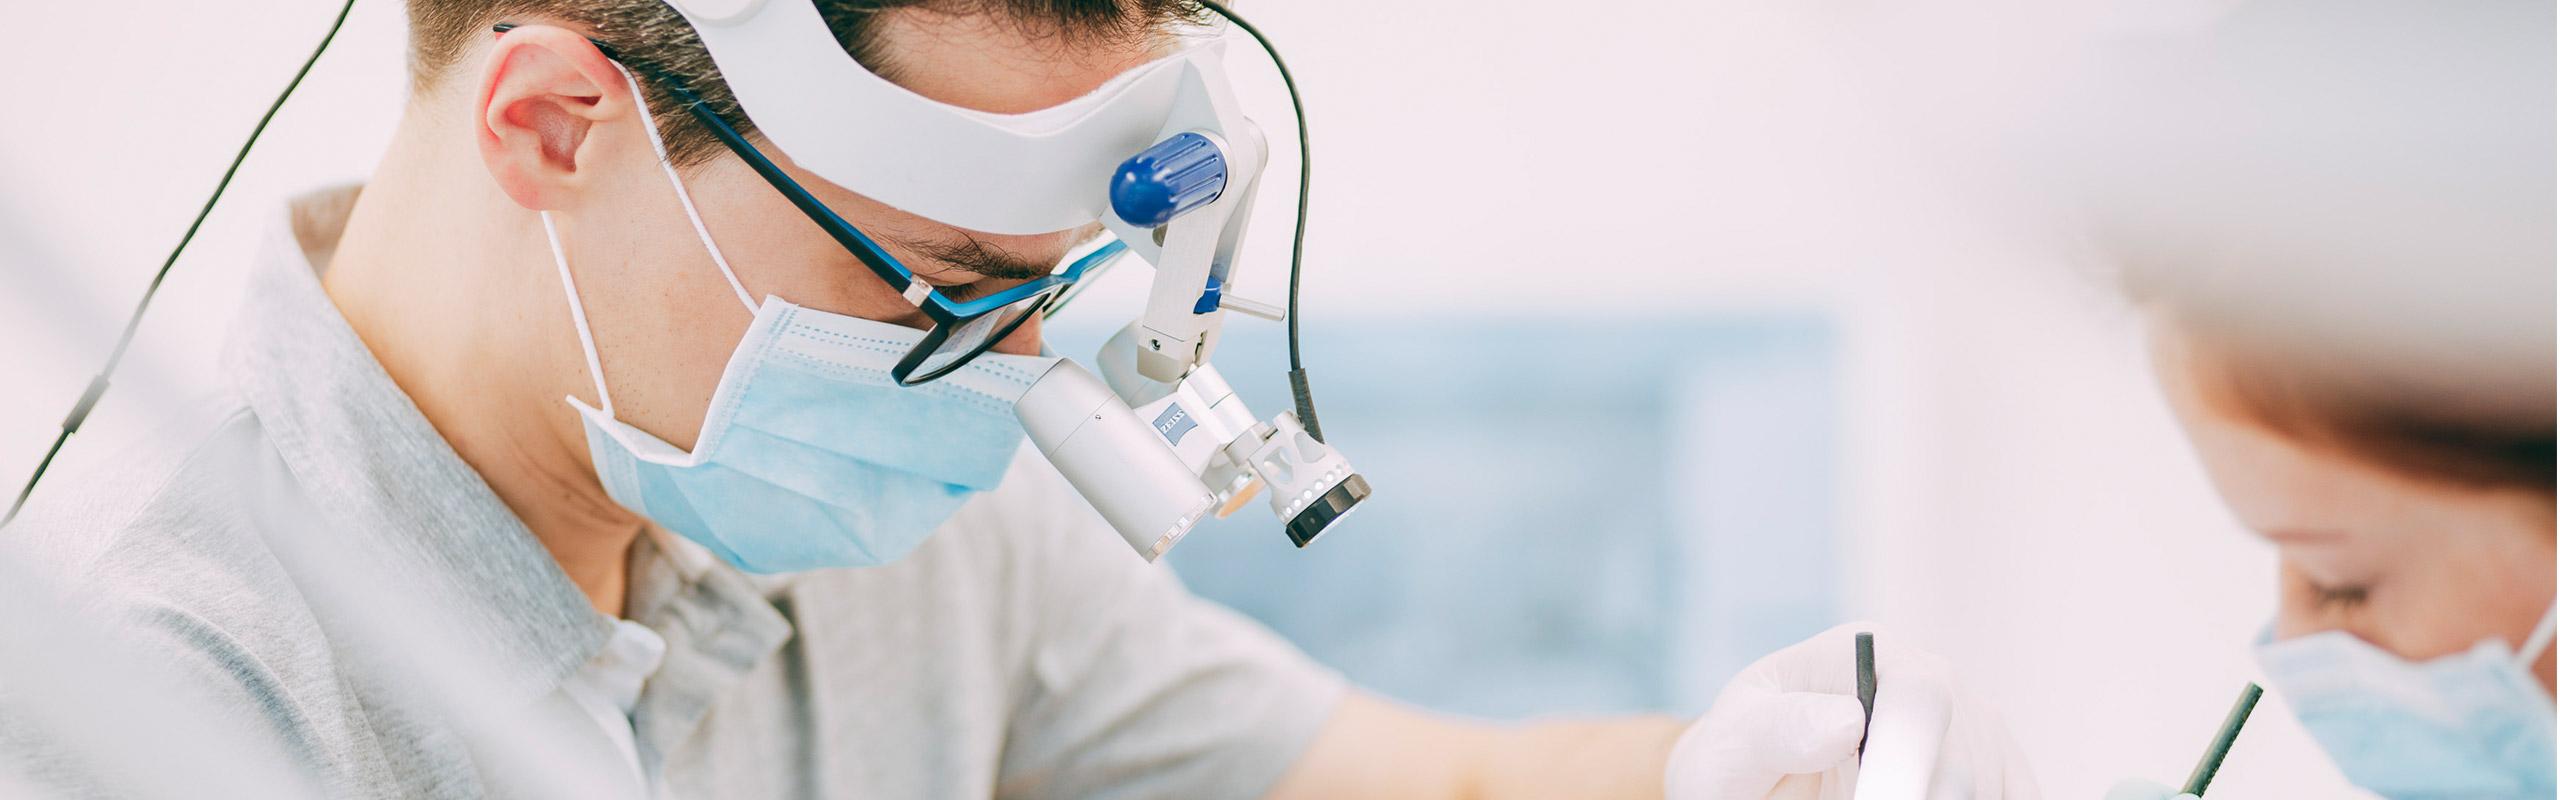 Moderne Zahnwurzelbehandlung mit Hilfsmitteln in Bonn-Oberkassel.